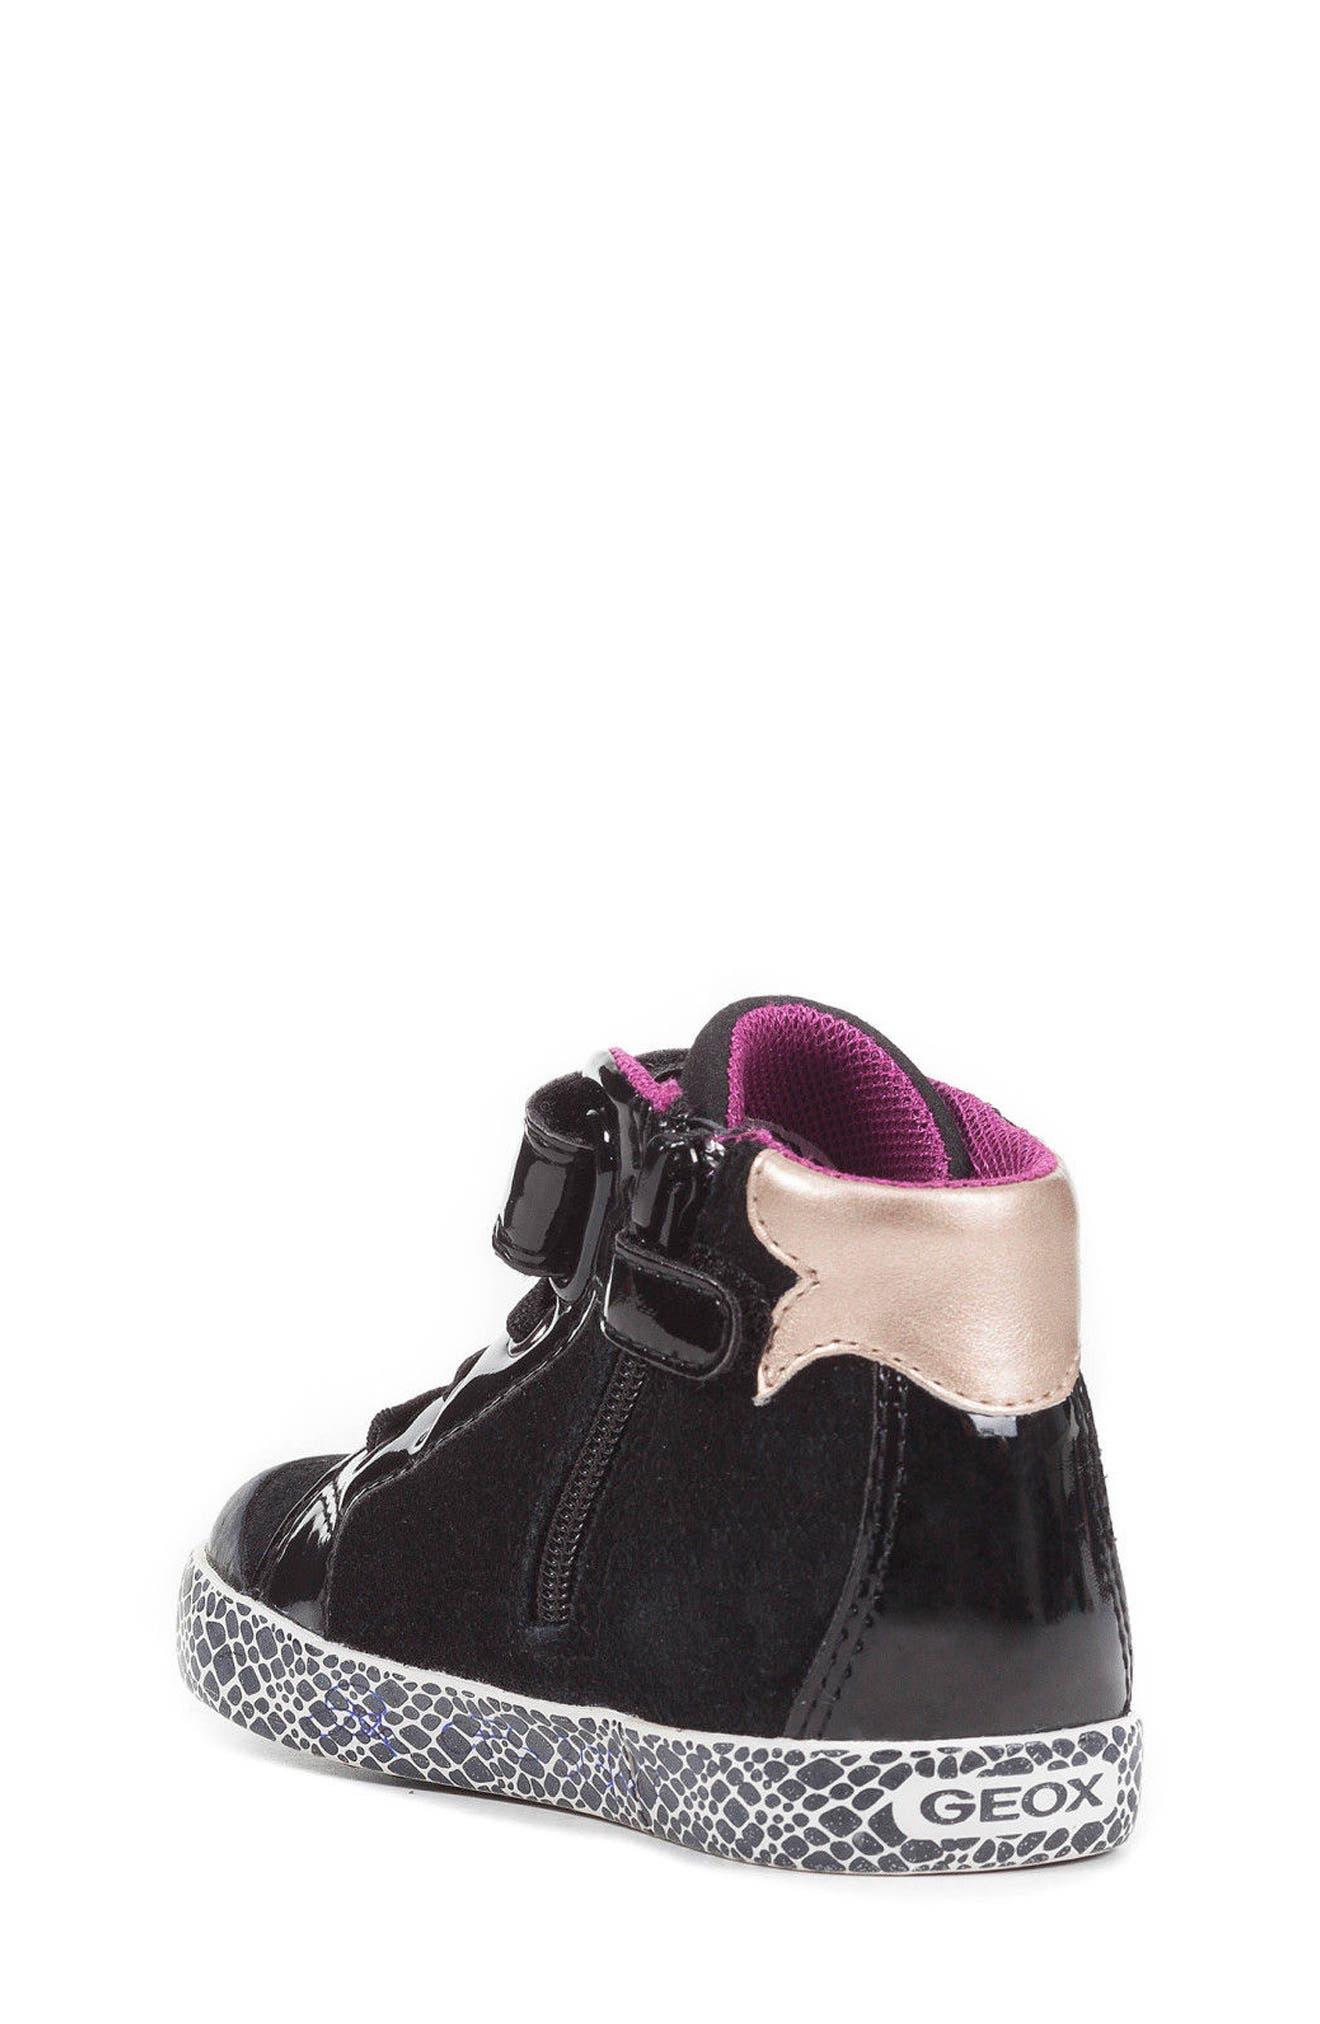 Kiwi Girl High Top Sneaker,                             Alternate thumbnail 2, color,                             Black/ Cyclamen